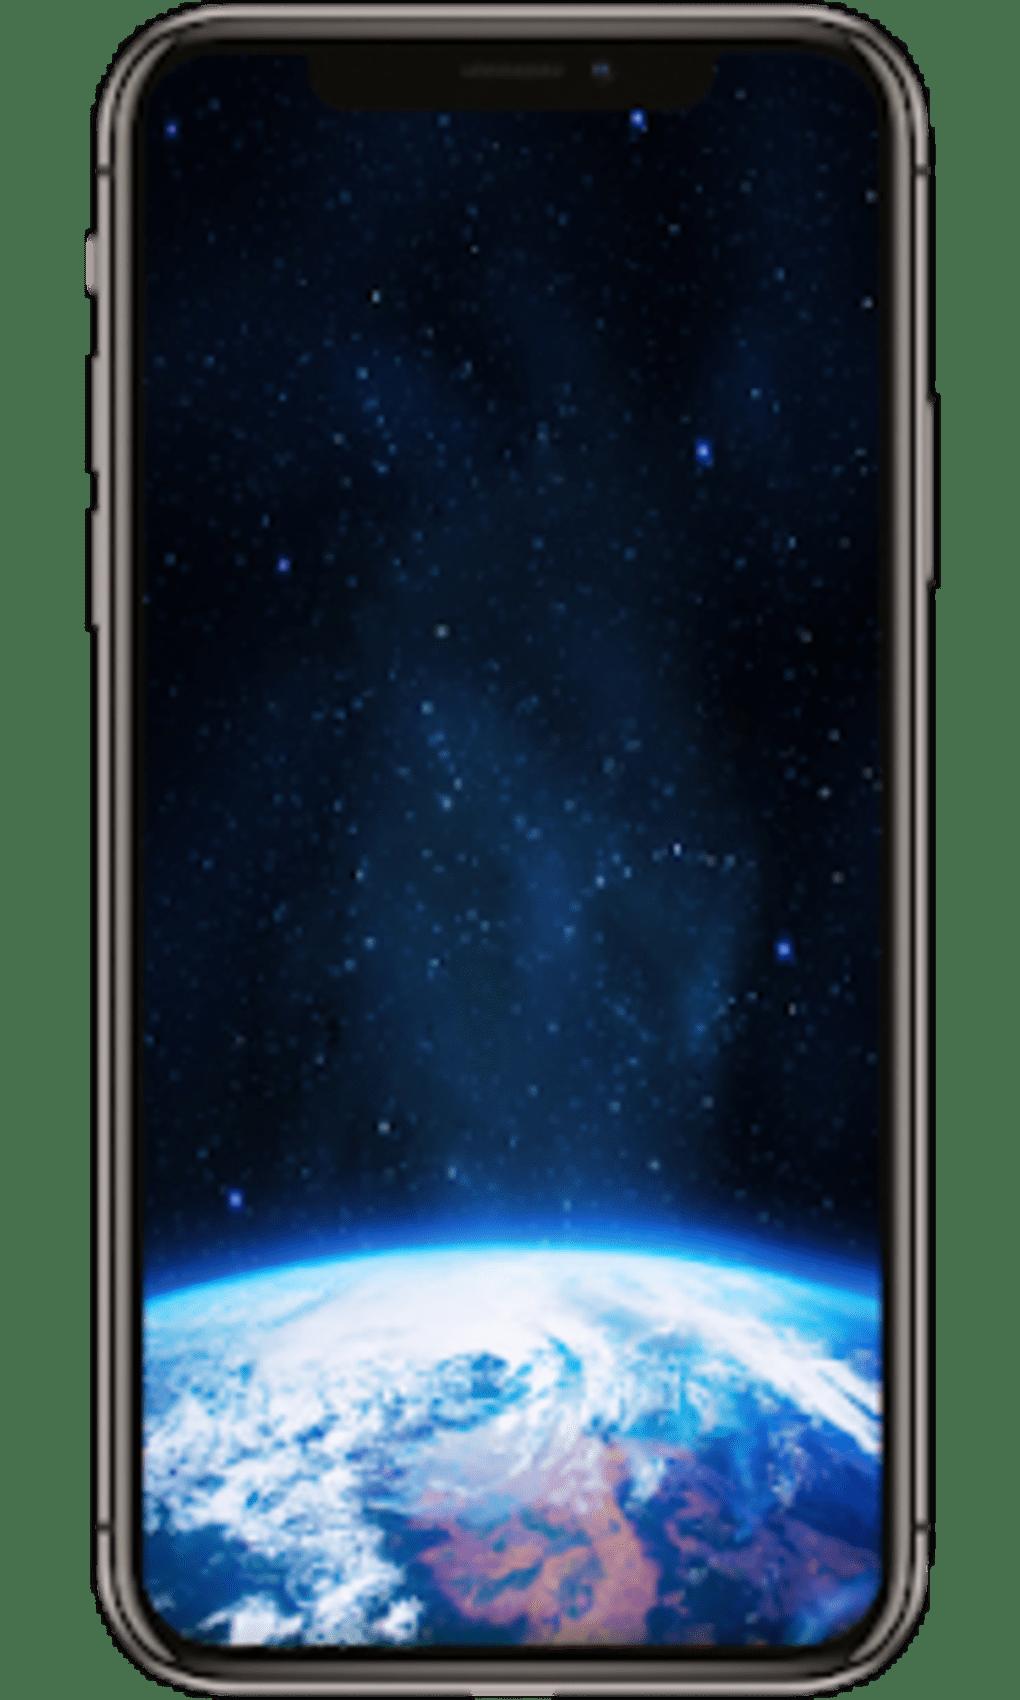 galaxy 3d lock screen galaxy 3d wallpapers hd free screenshot